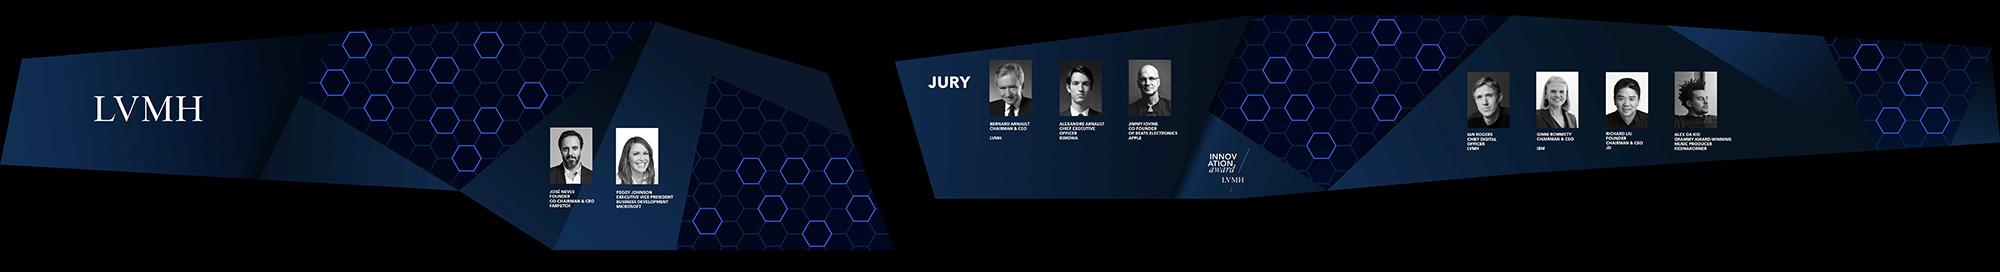 infodecor-jury-lvmh-clemence-devienne